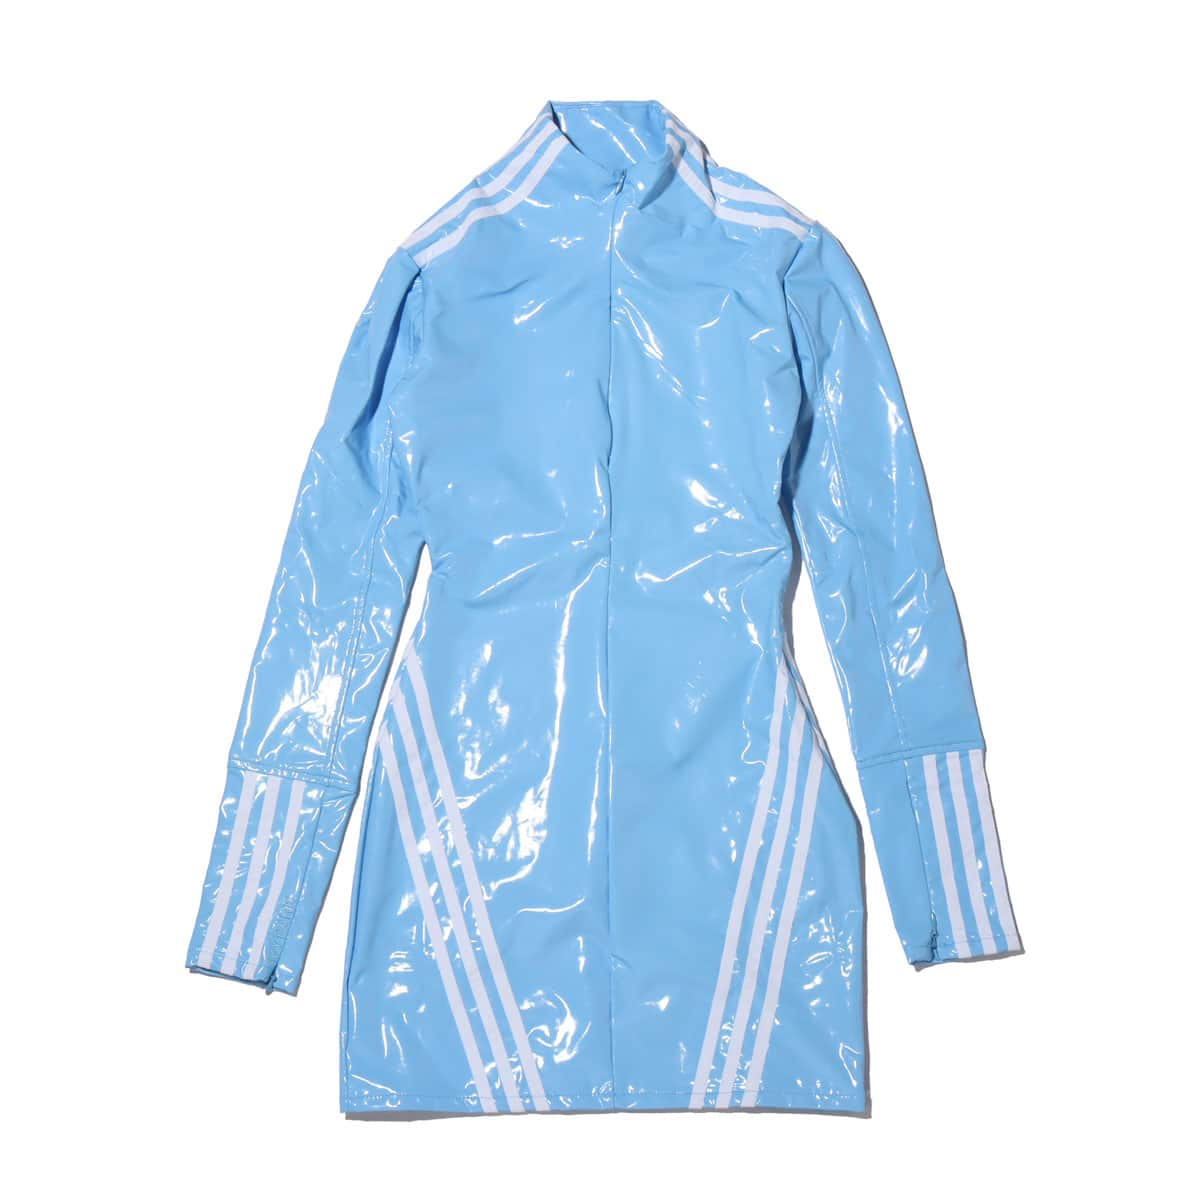 adidas IVP LATEX DRESS LIGHT BLUE/WHITE 21SS-S_photo_large